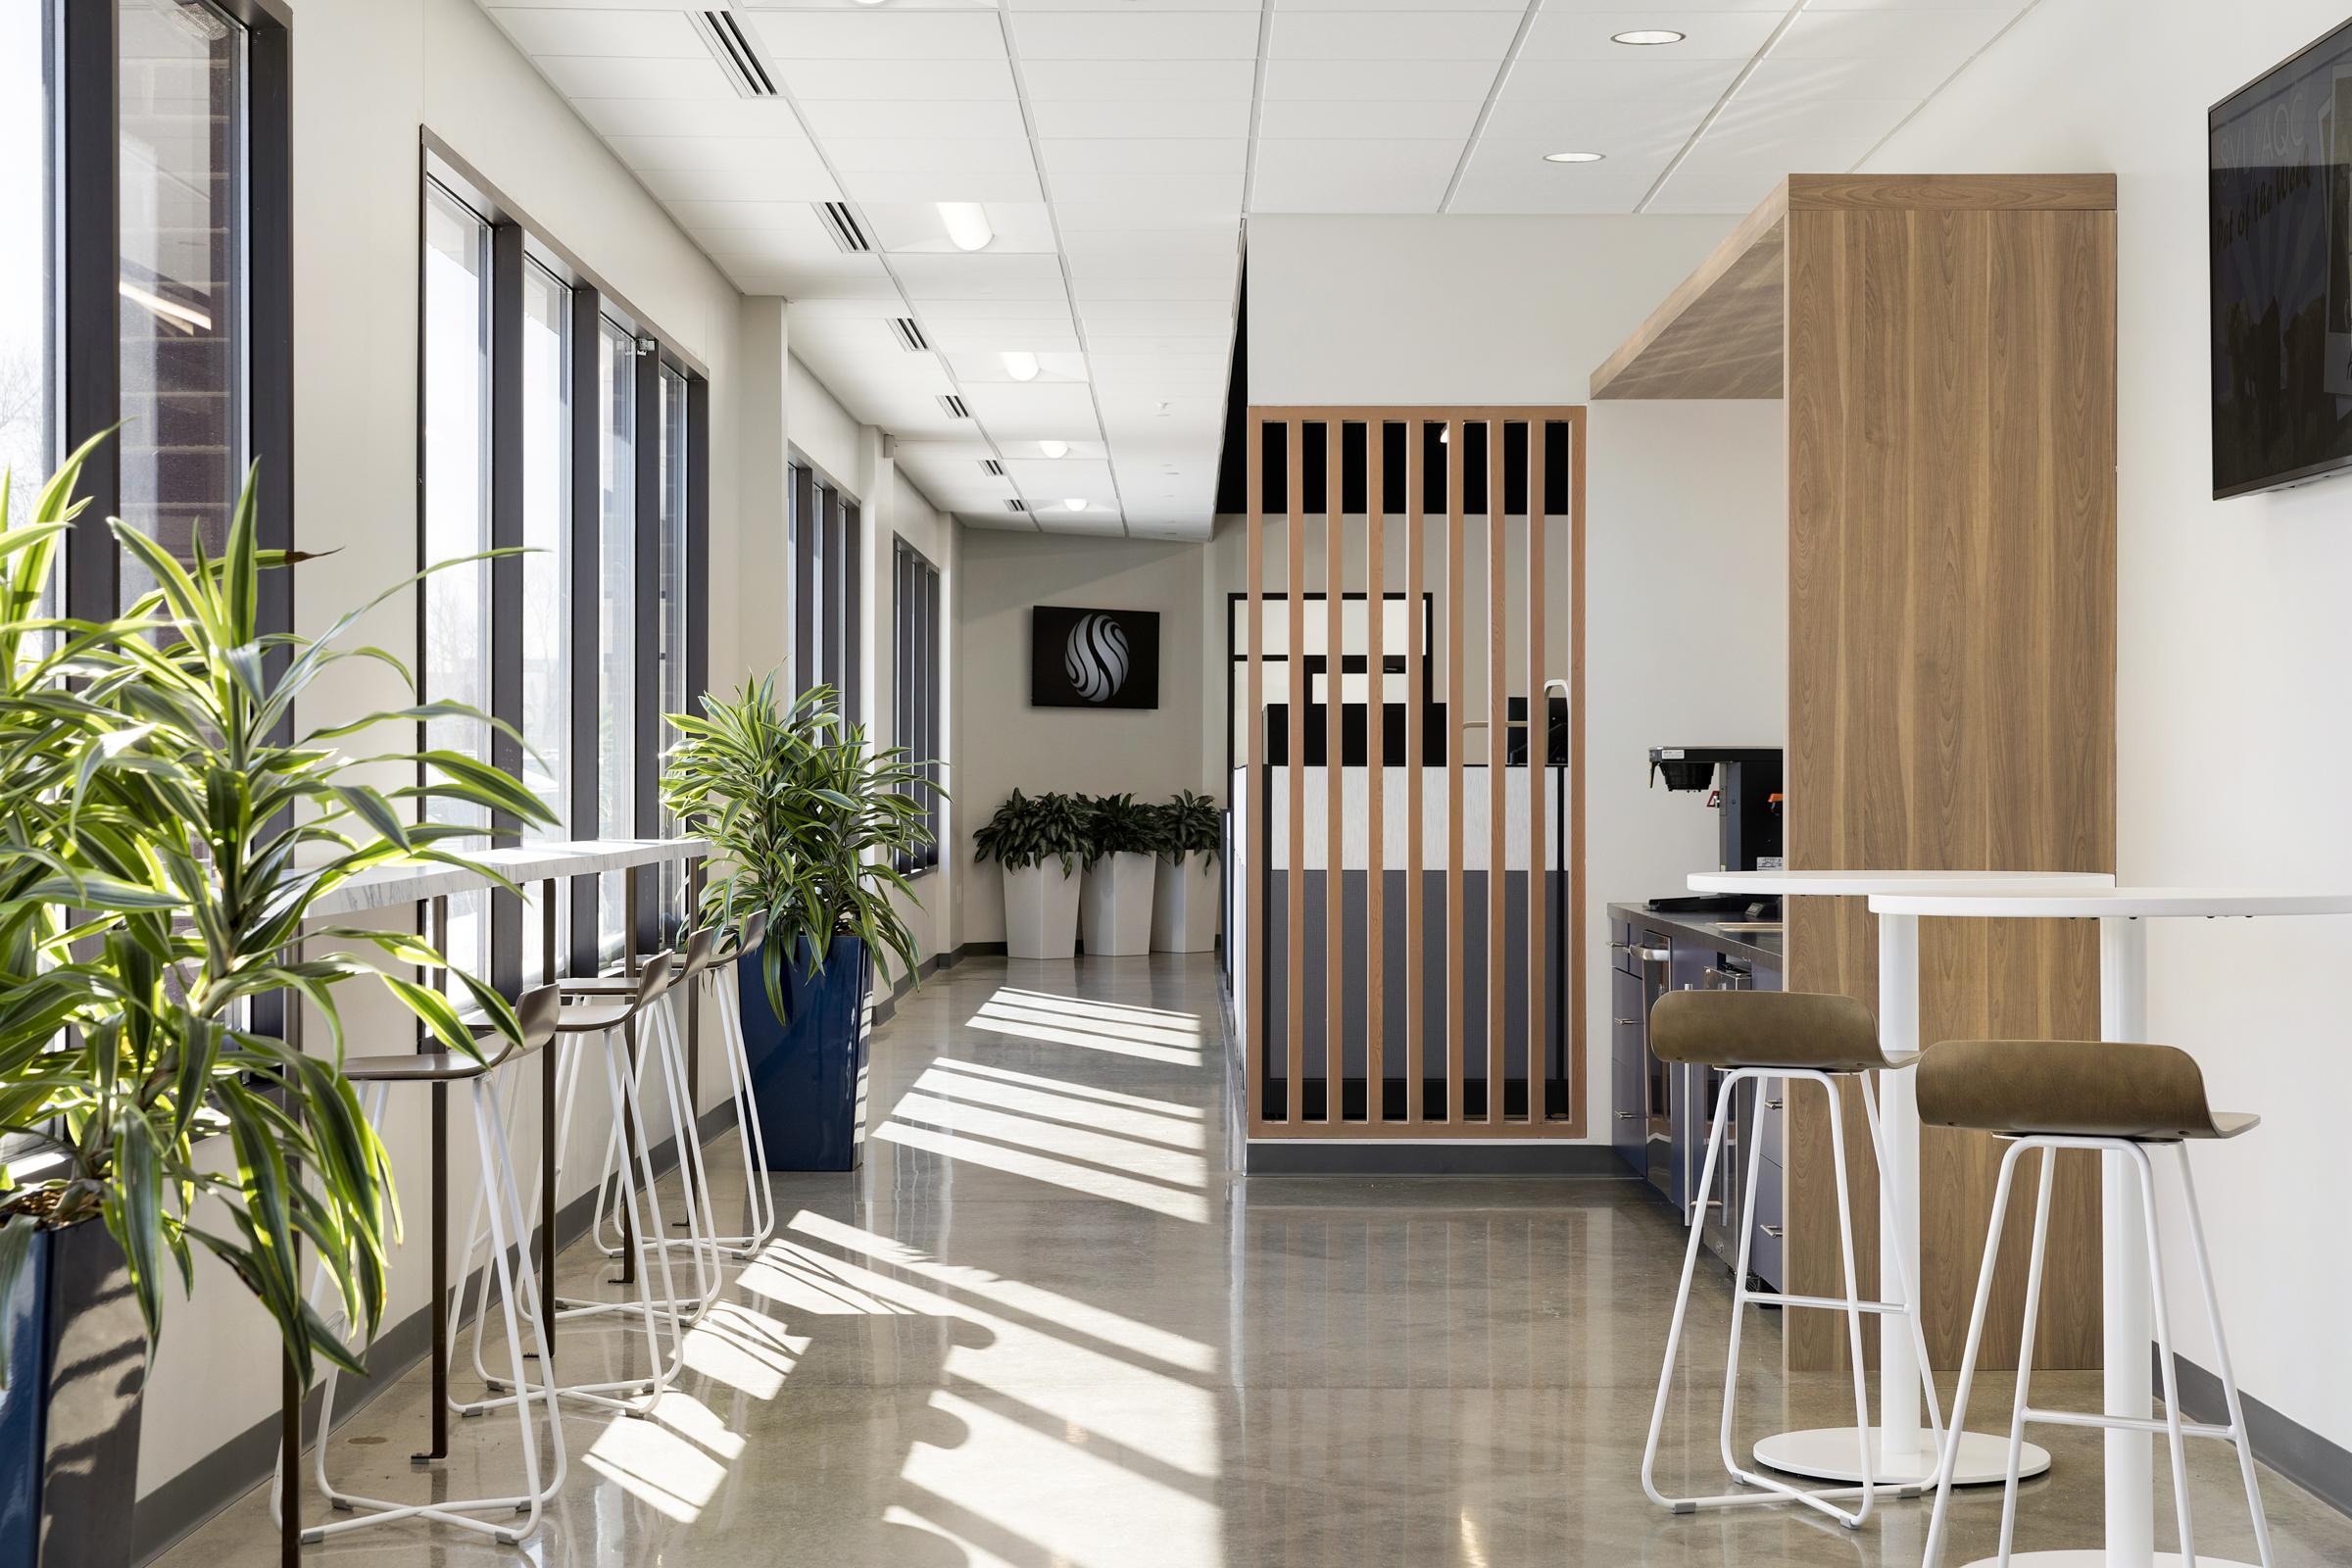 Office Cafe | Vela Creative Interior Design | Commercial Interiors Minneapolis